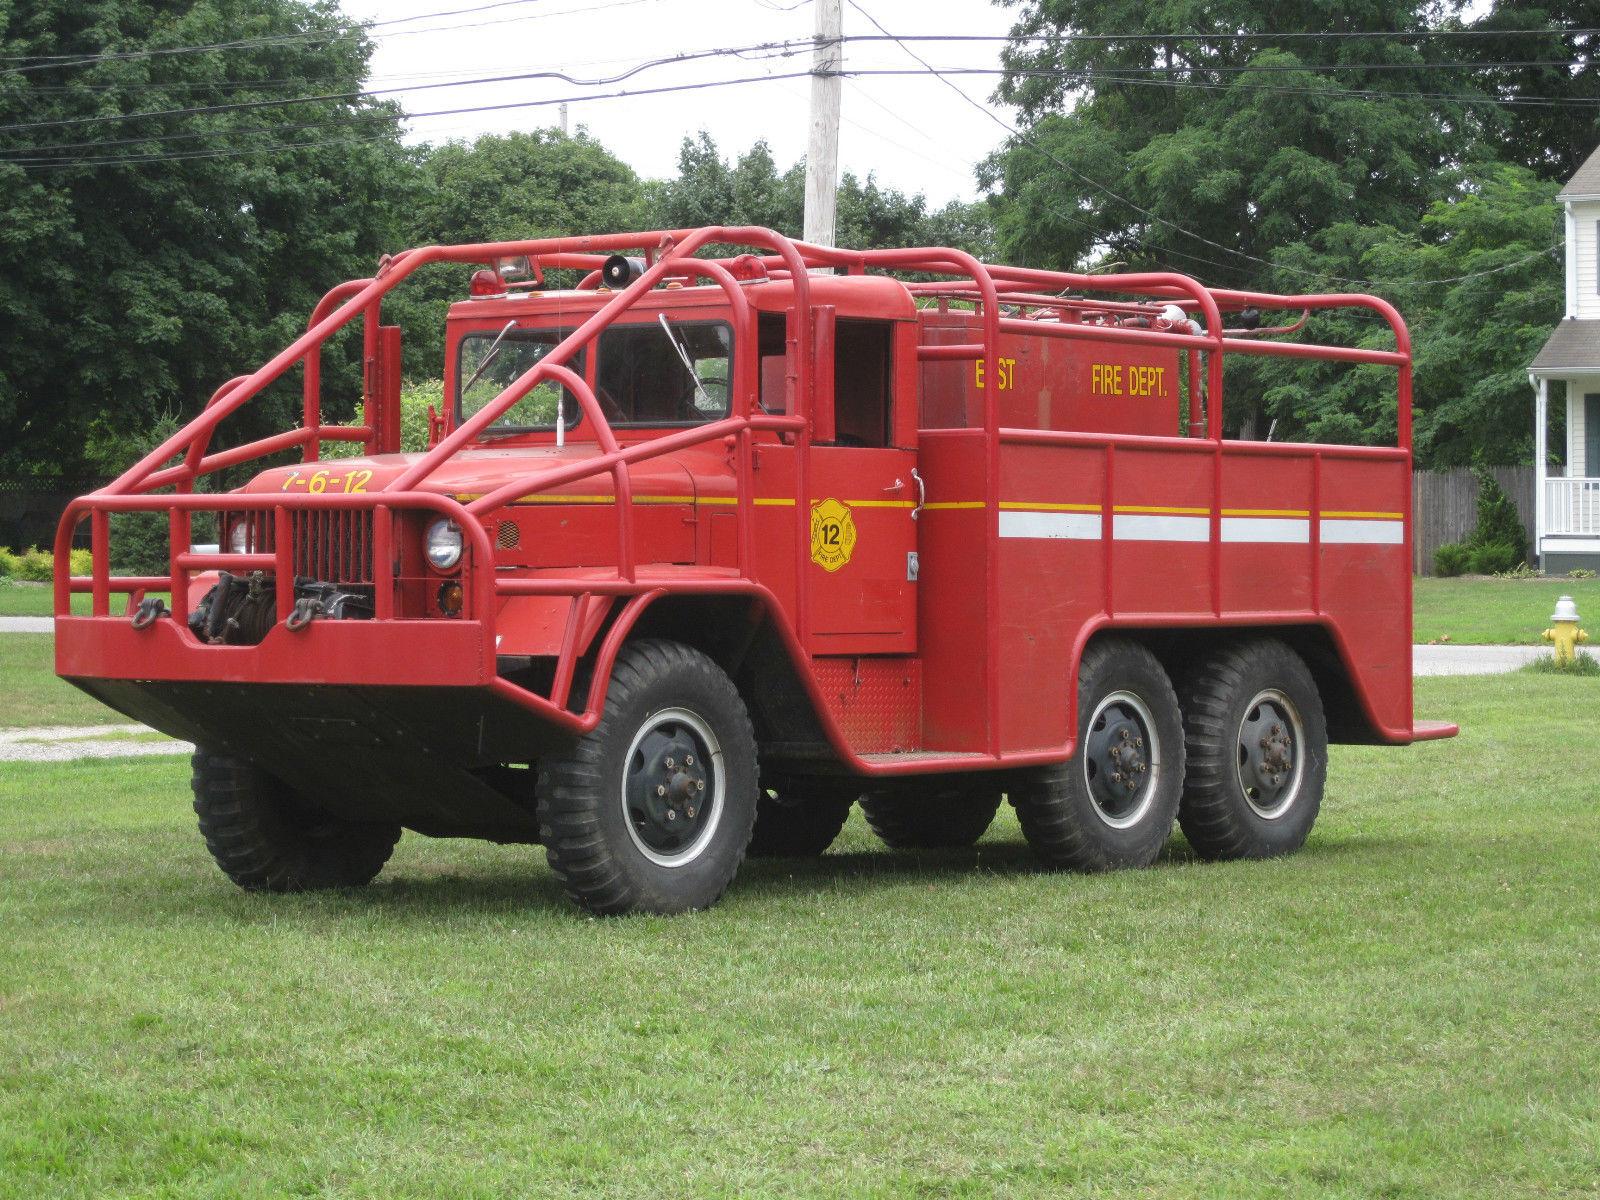 Craigslist Rc Cars And Trucks